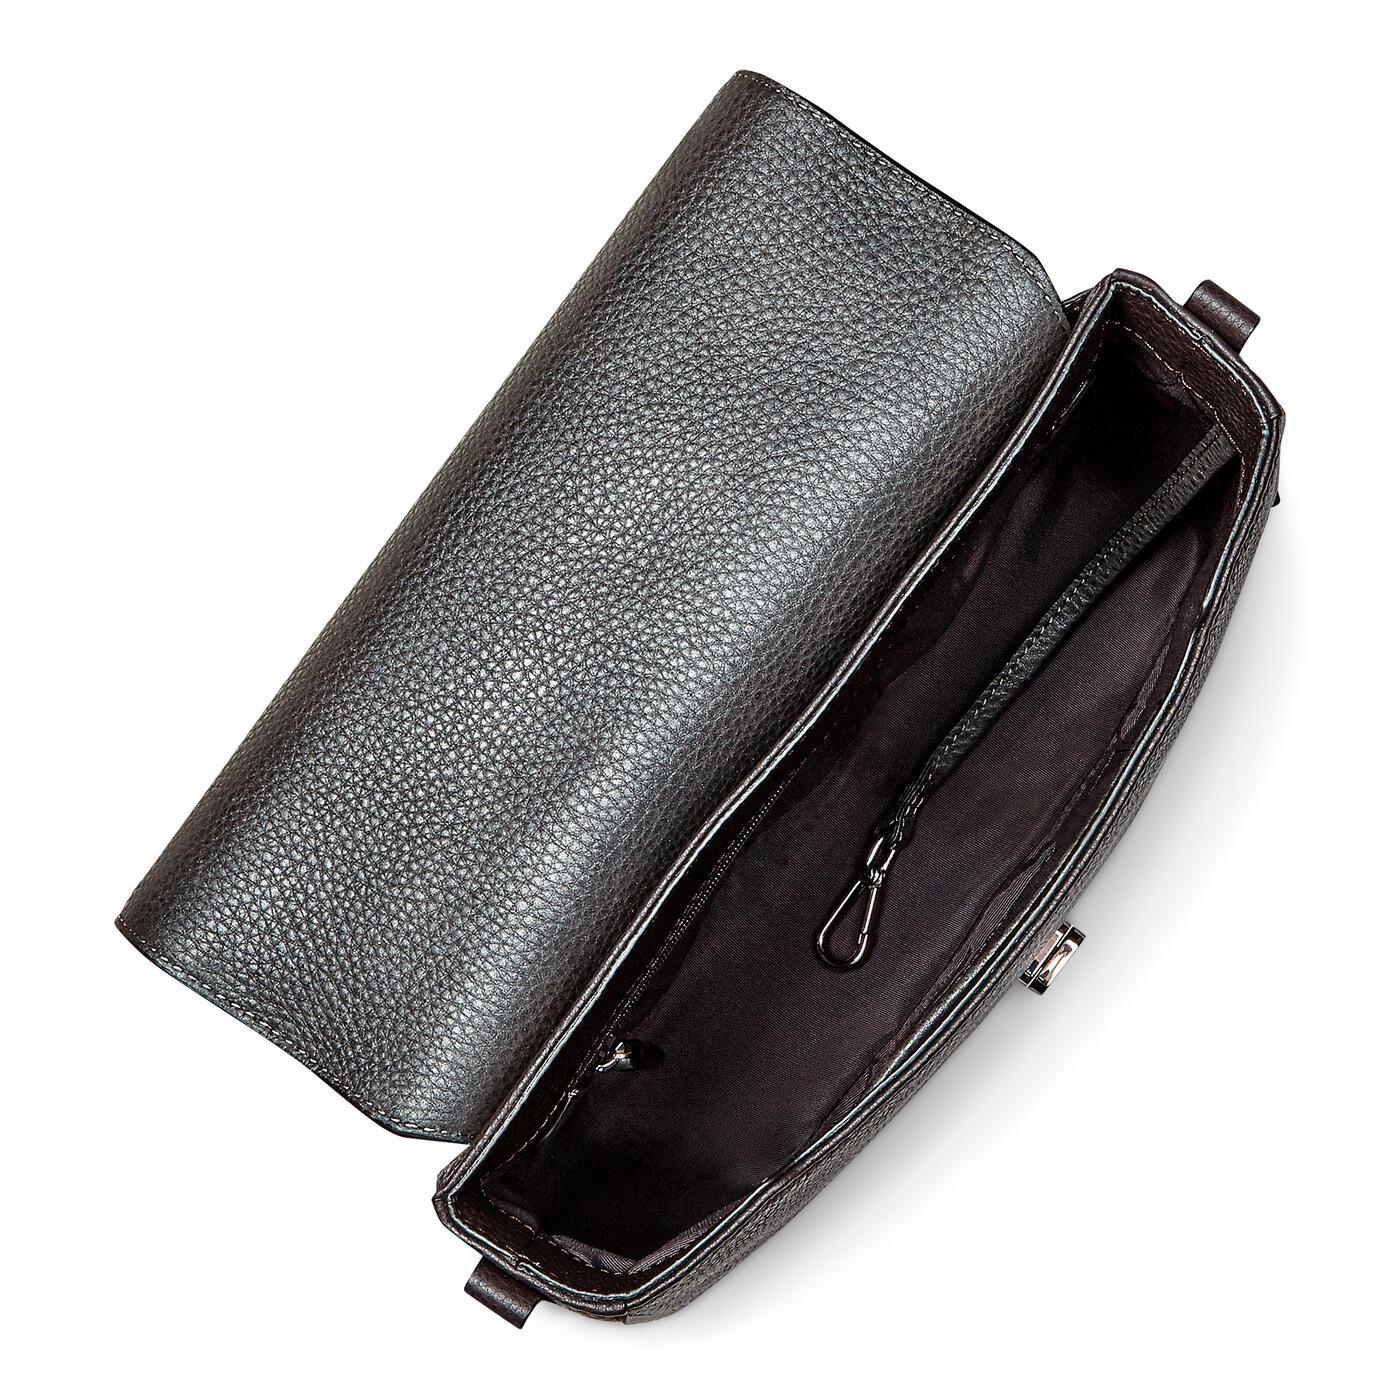 ECCO KAUAI Ikon22 Medium Saddle Bag